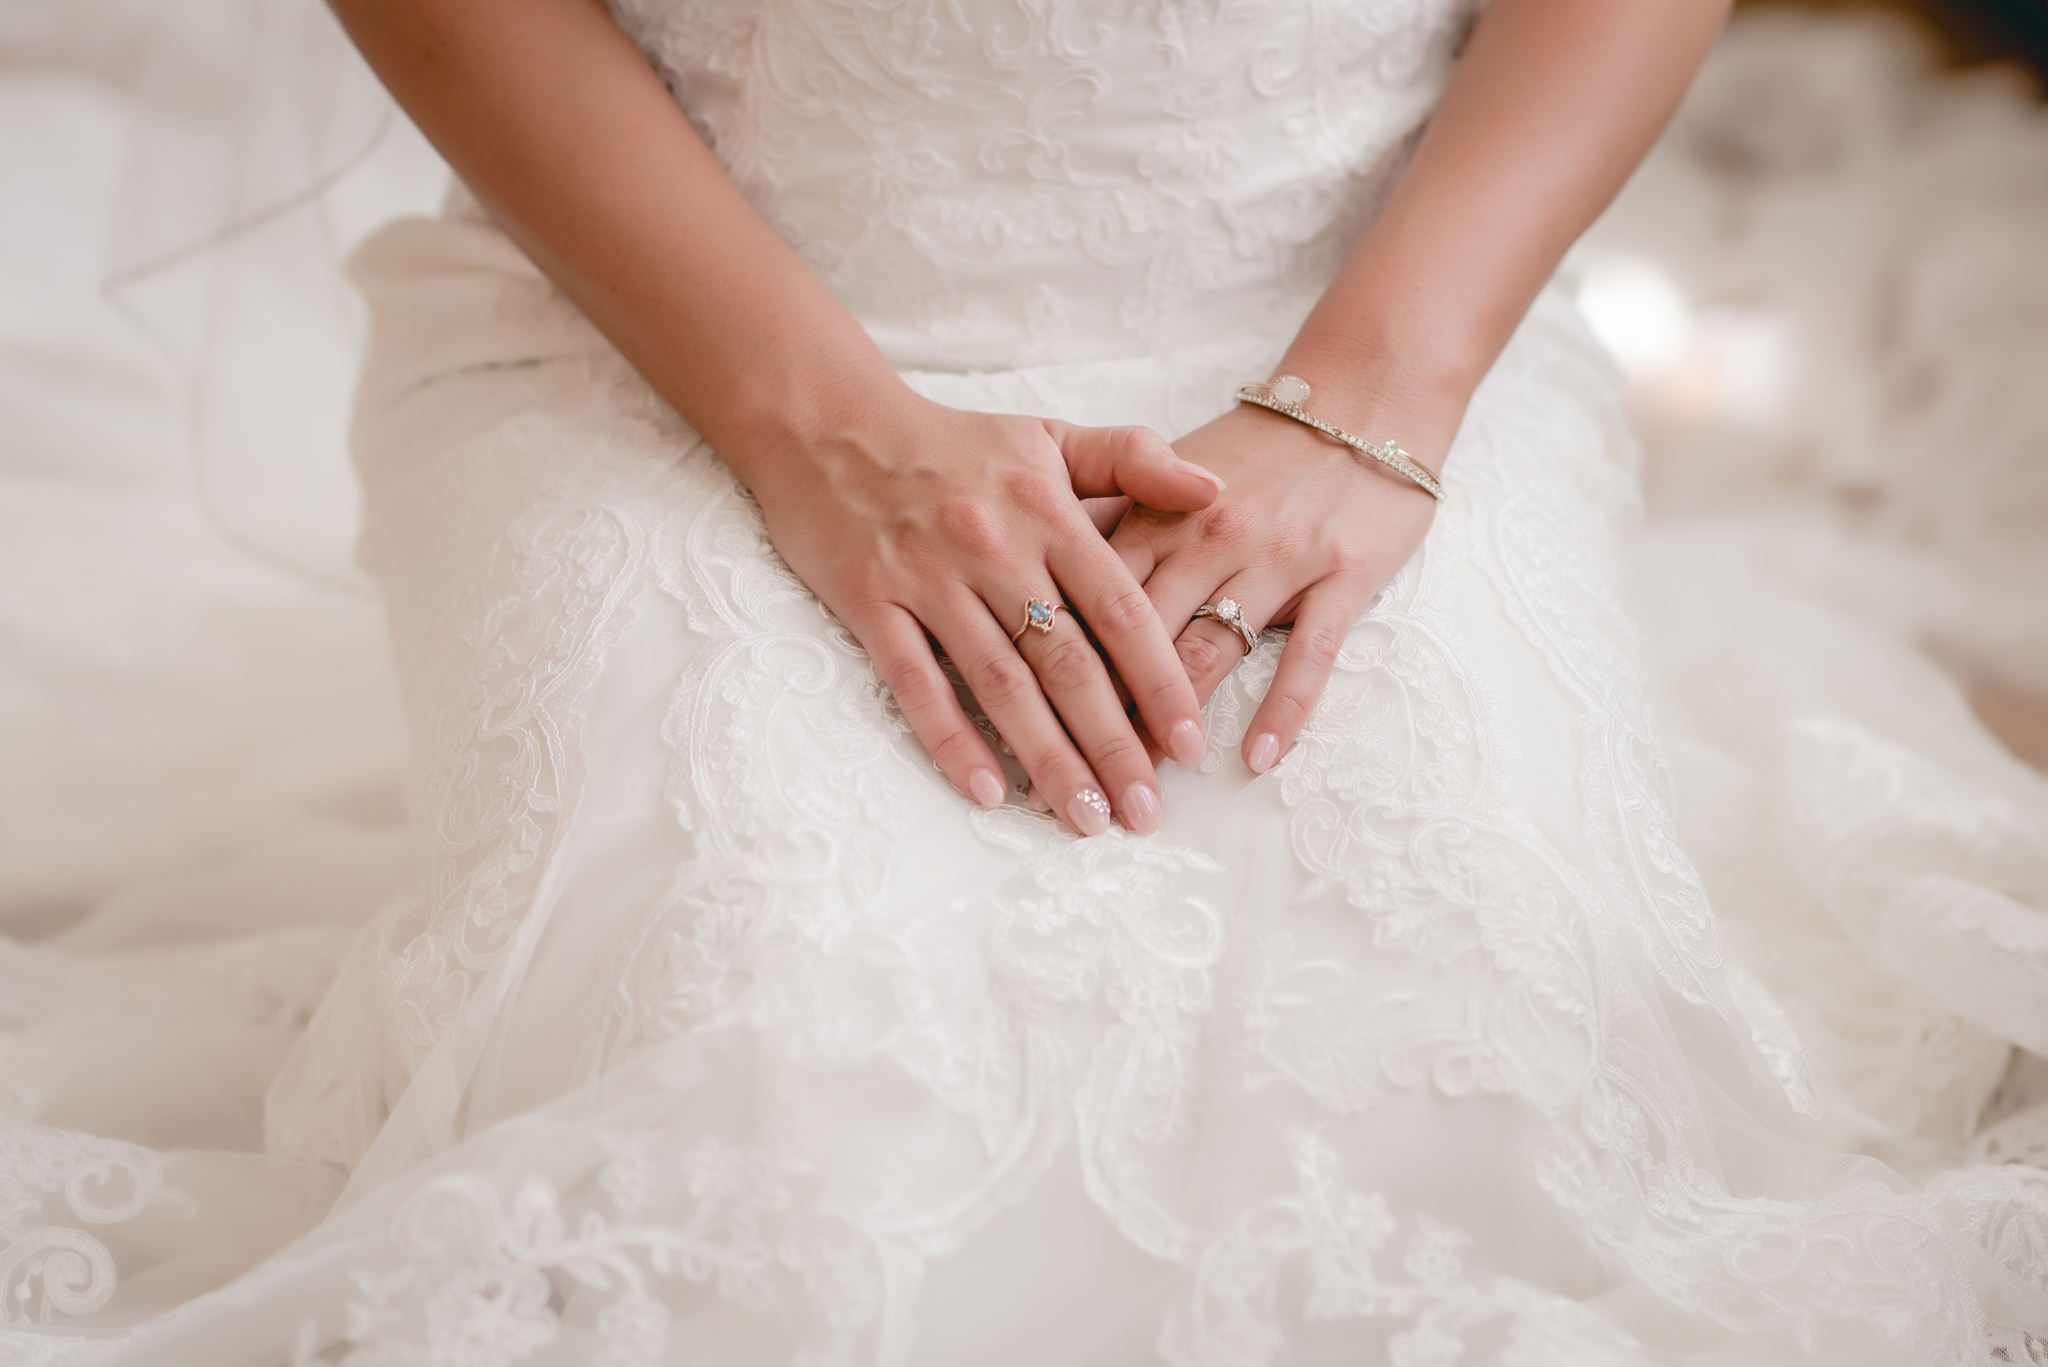 Closeup of bride's hands resting on her wedding dress